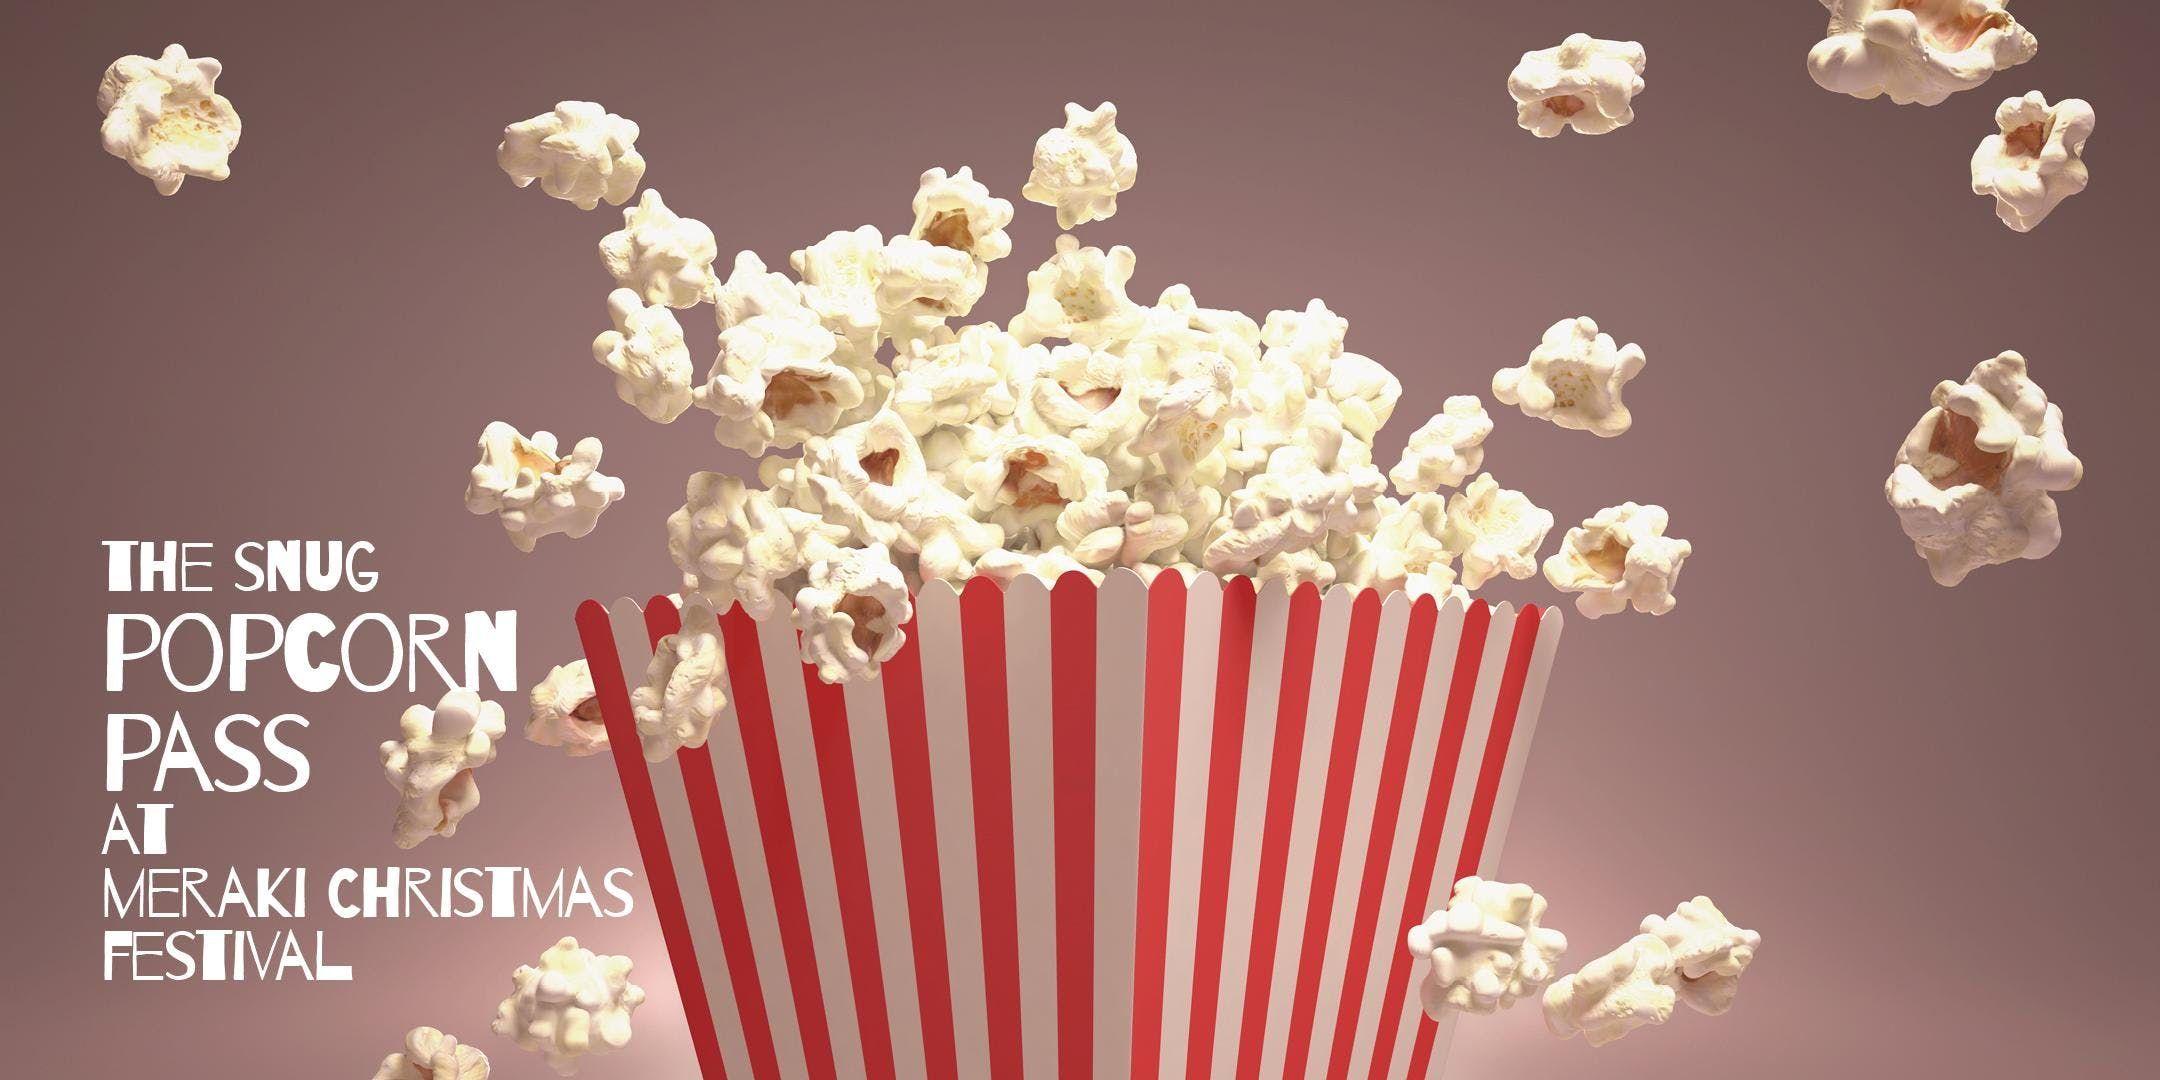 The Snug Popcorn Pass Wednesday 12 Dec